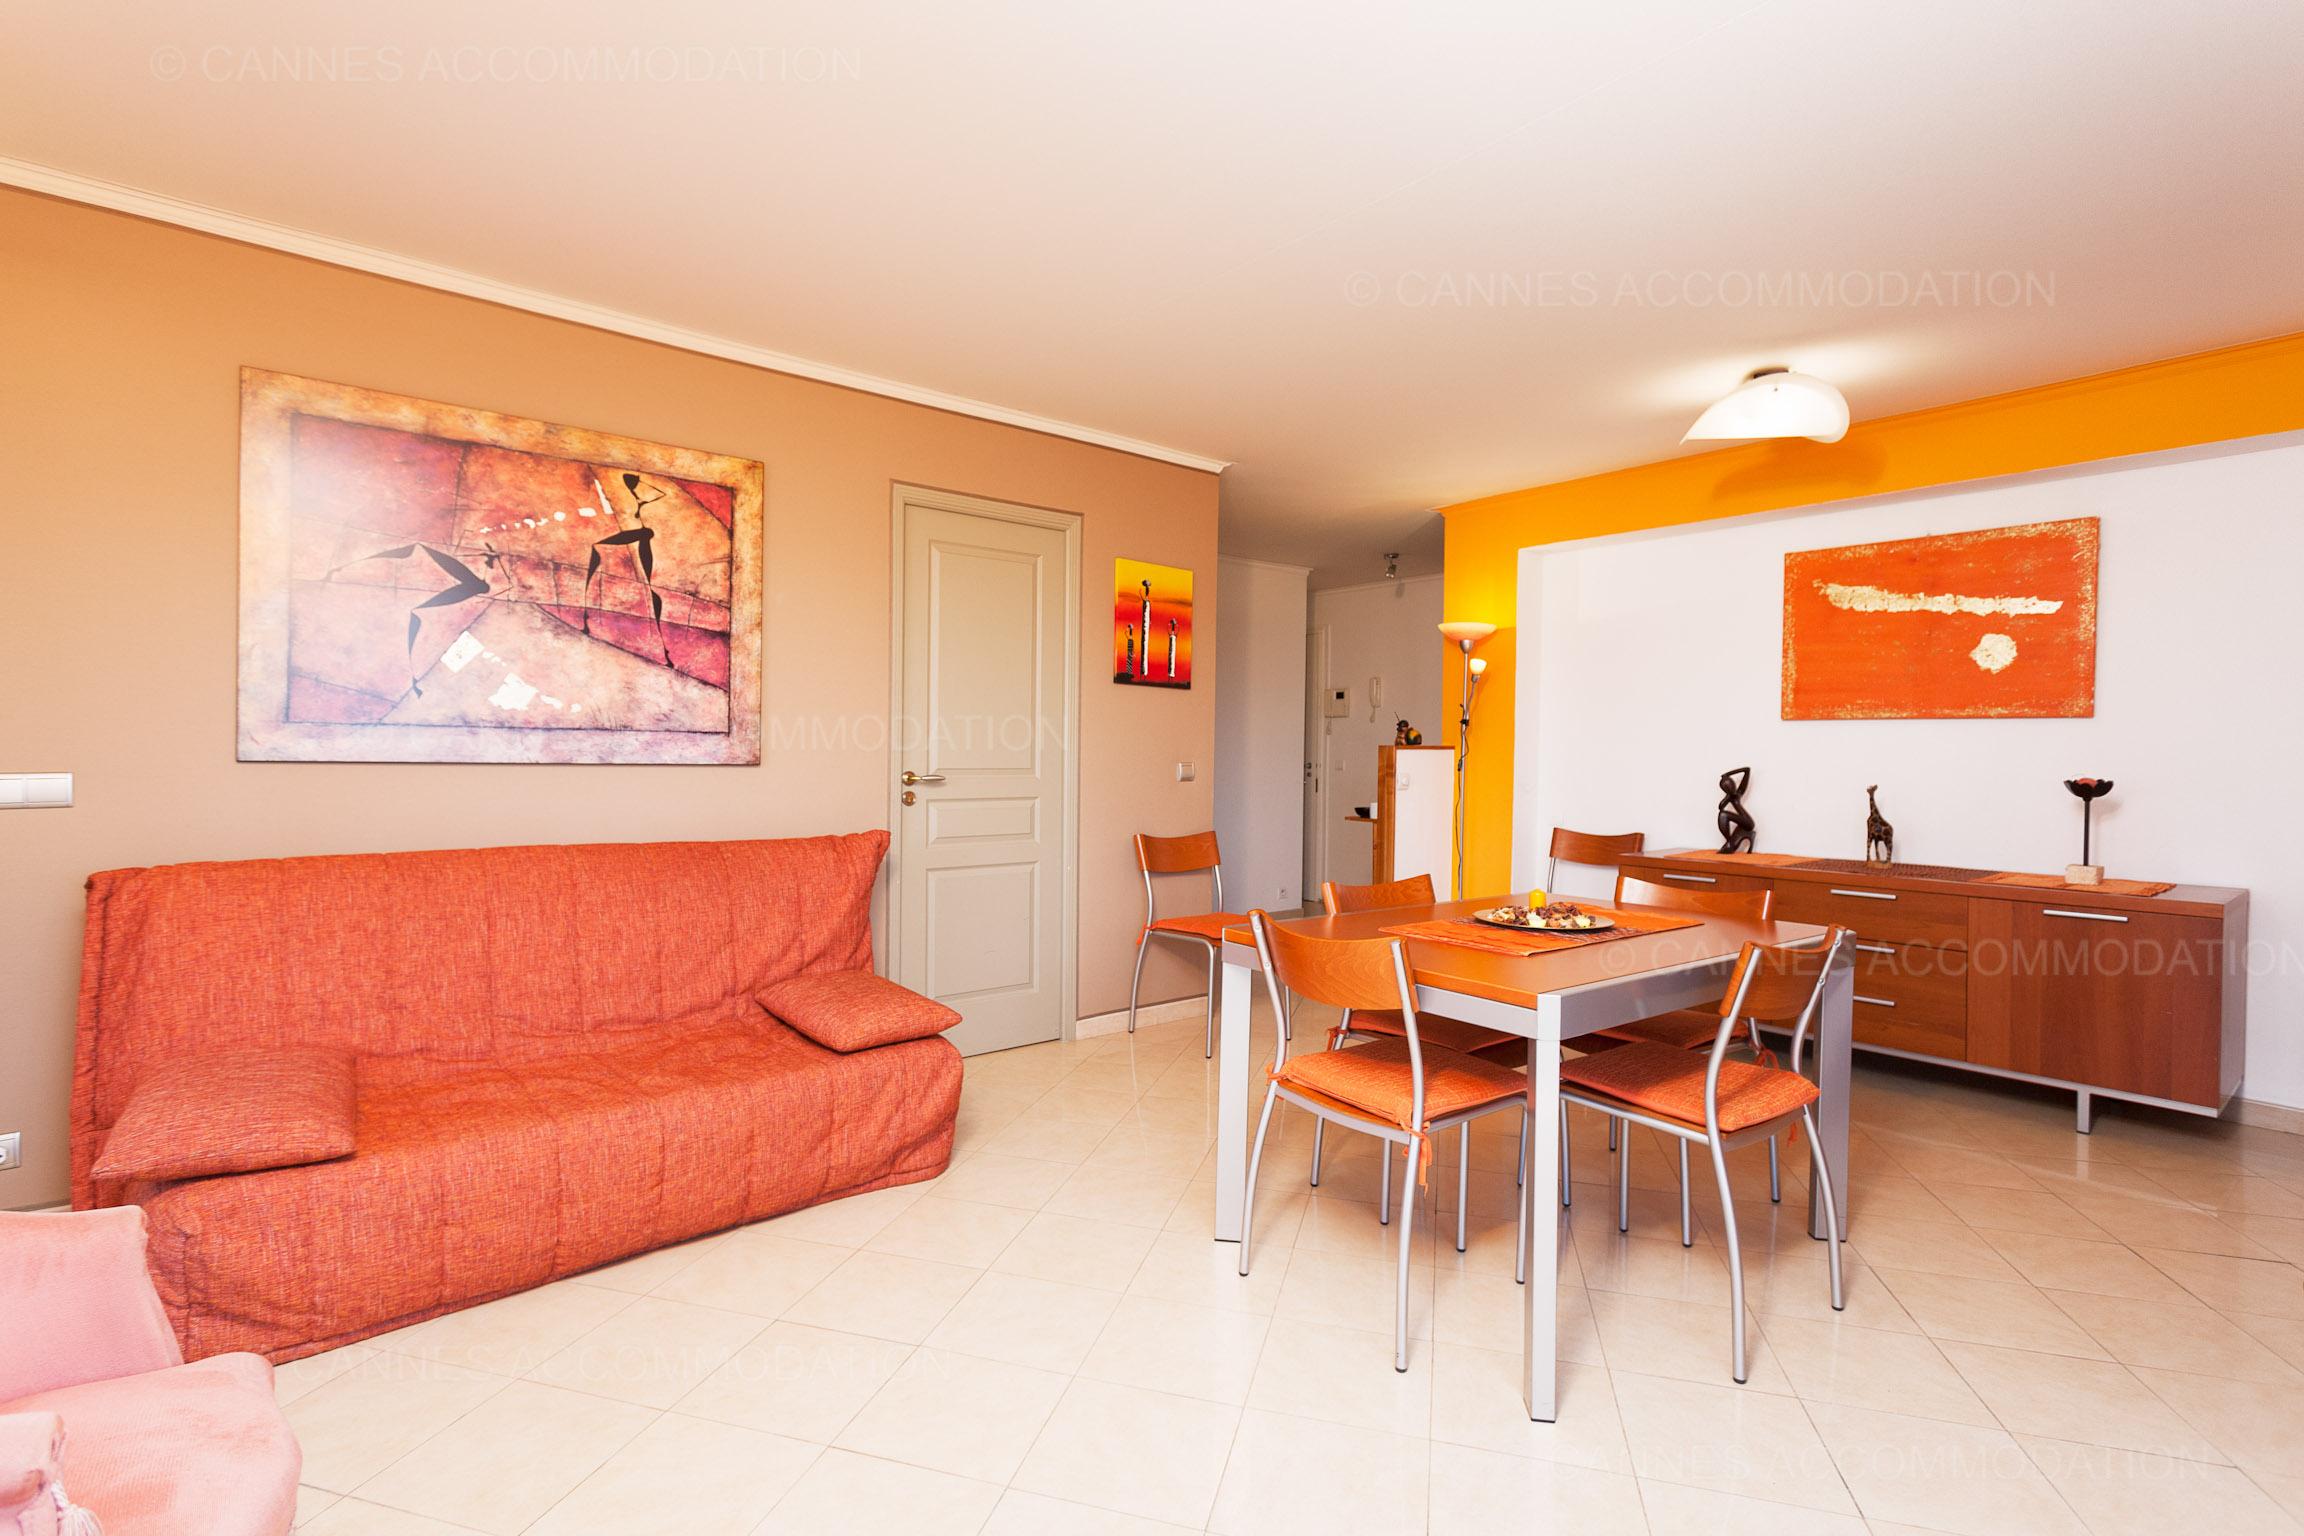 Appartement 2 chambres louer cannes secteur carlton for Hotel martinez cannes tarifs chambres